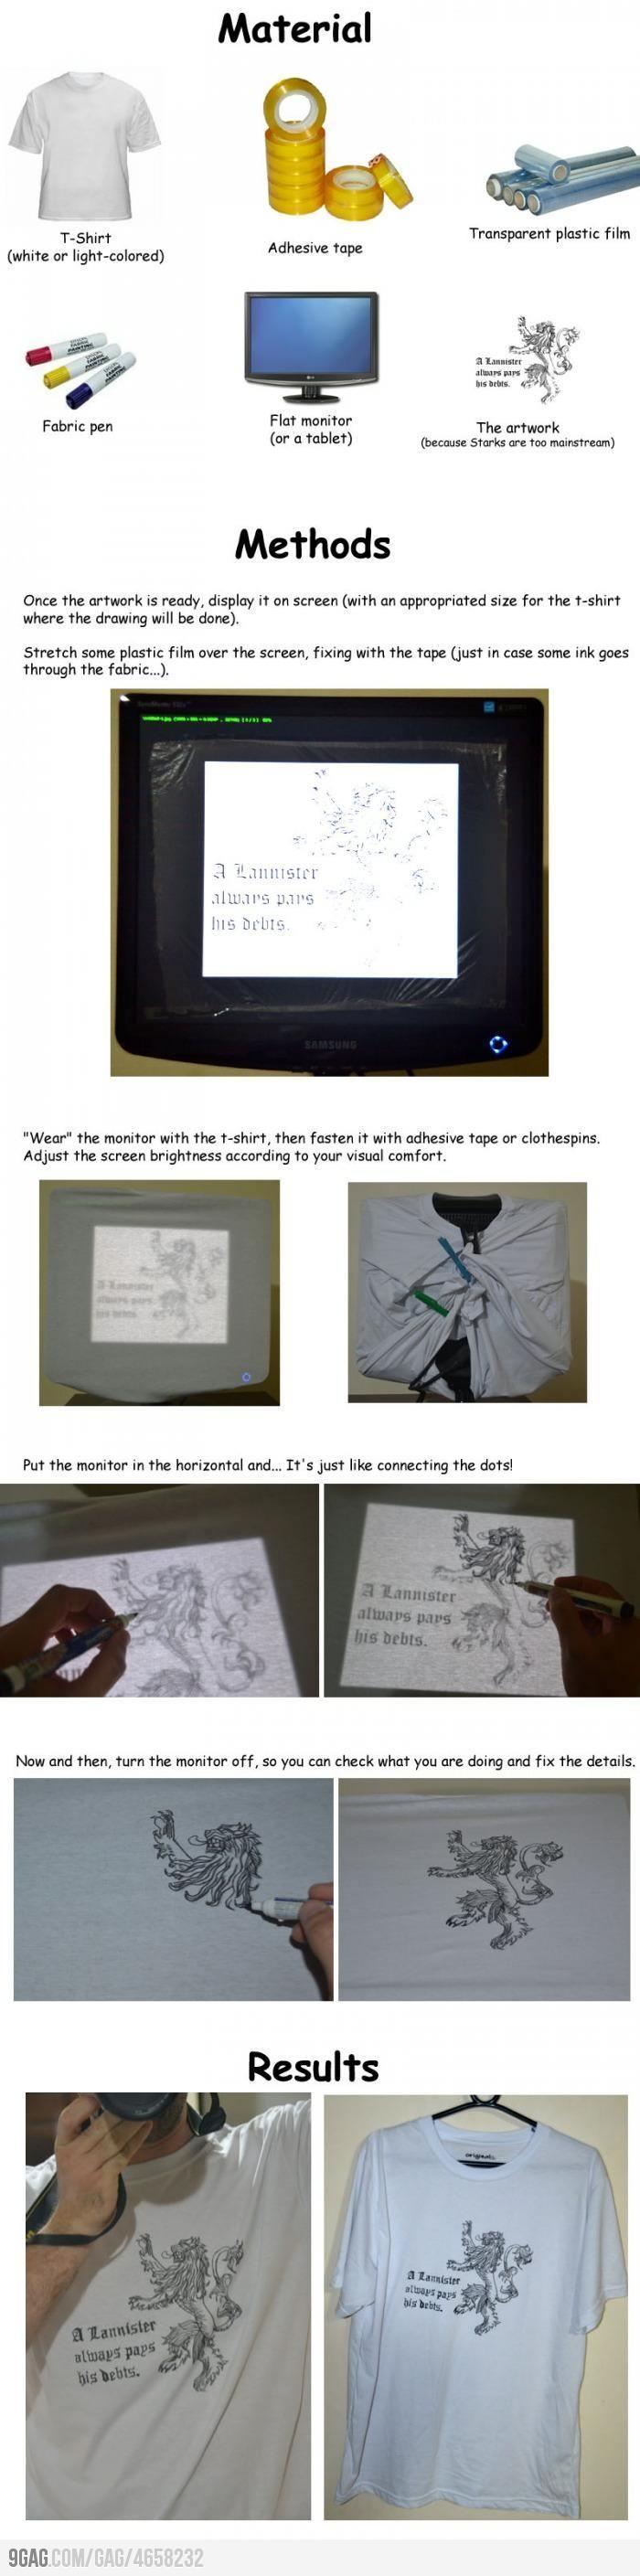 9GAG - Poor man's t-shirt printer